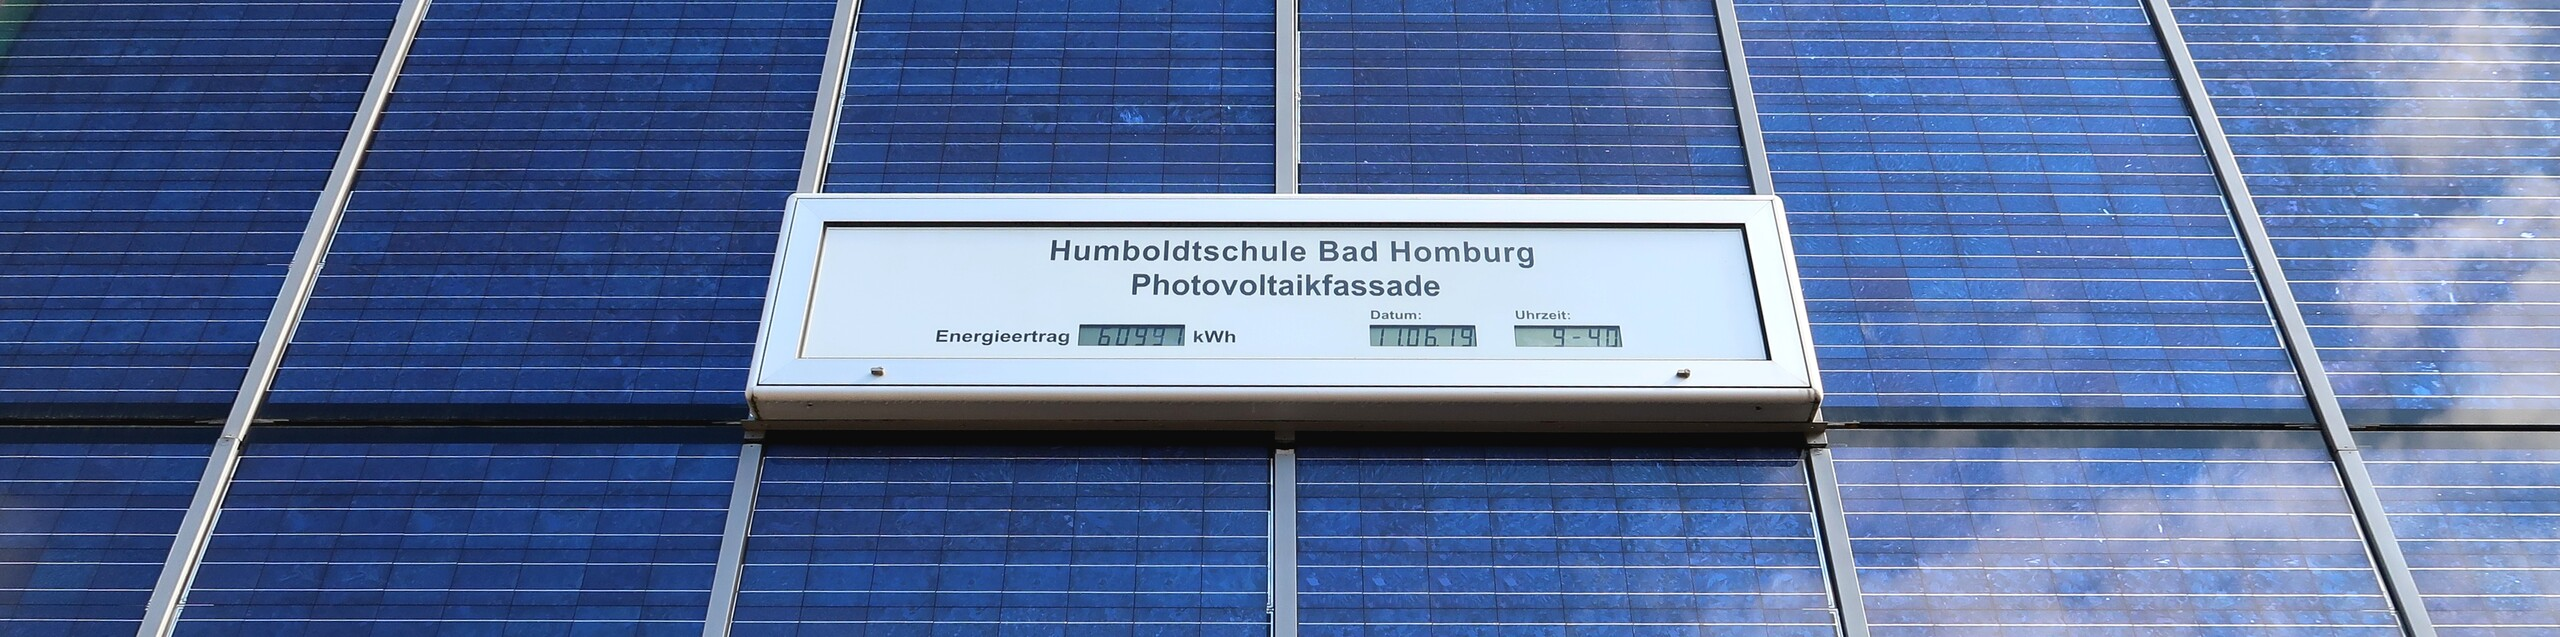 Photovoltaik-Fassade der Humboldtschule